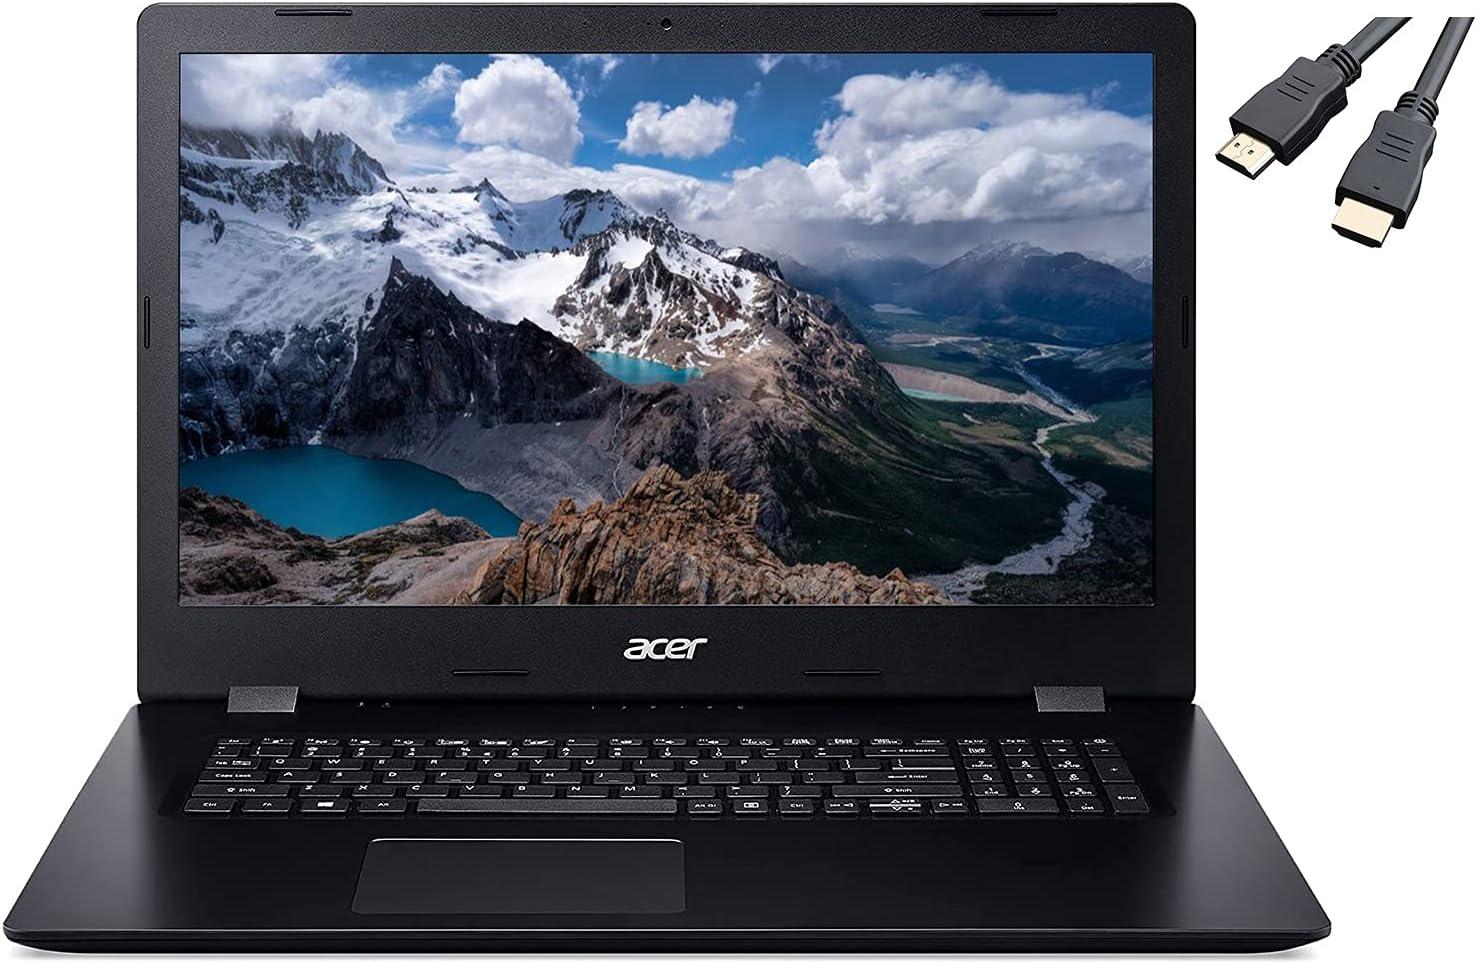 2021 Newest Acer Aspire 3 17.3'' HD+ Laptop, 4-core Intel i5-1035G1(up to 3.60 GHz), 20GB RAM 1TB HDD+256GB PCIe SSD, HDMI WiFi RJ-45 Bluetooth Webcam DVD-RW, Win 10 w/Ghost Manta Accessories